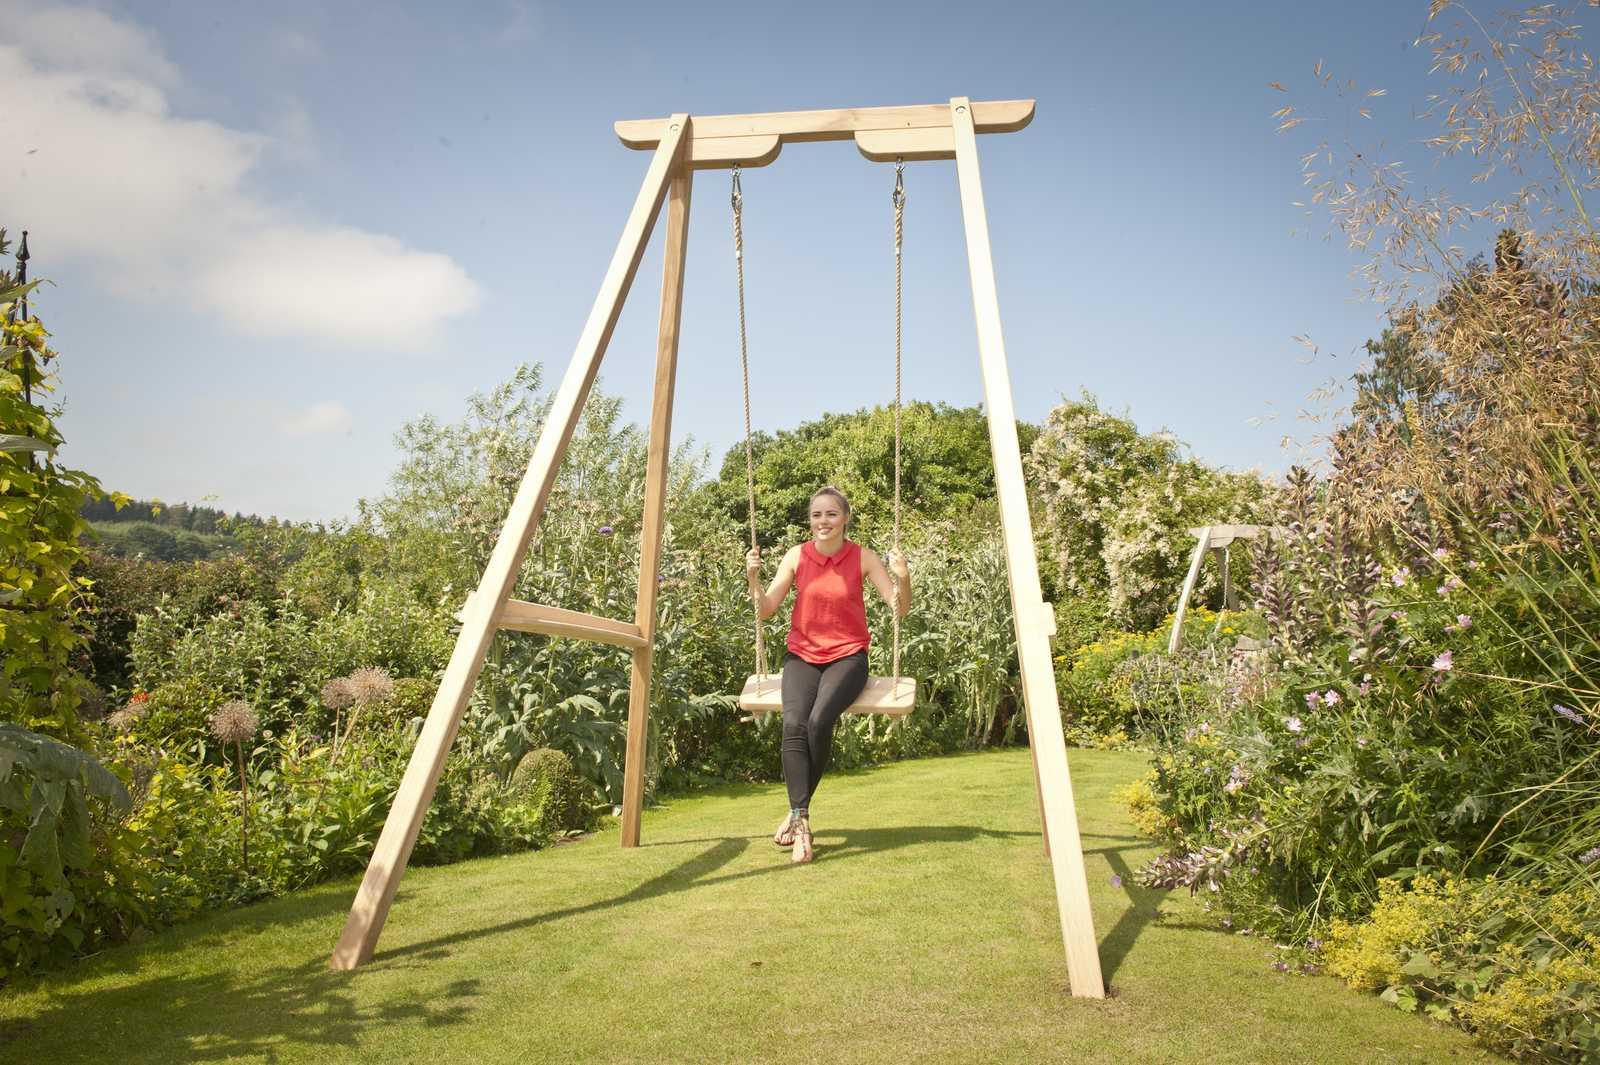 Oak Frame And Swing Set Sitting Spiritually